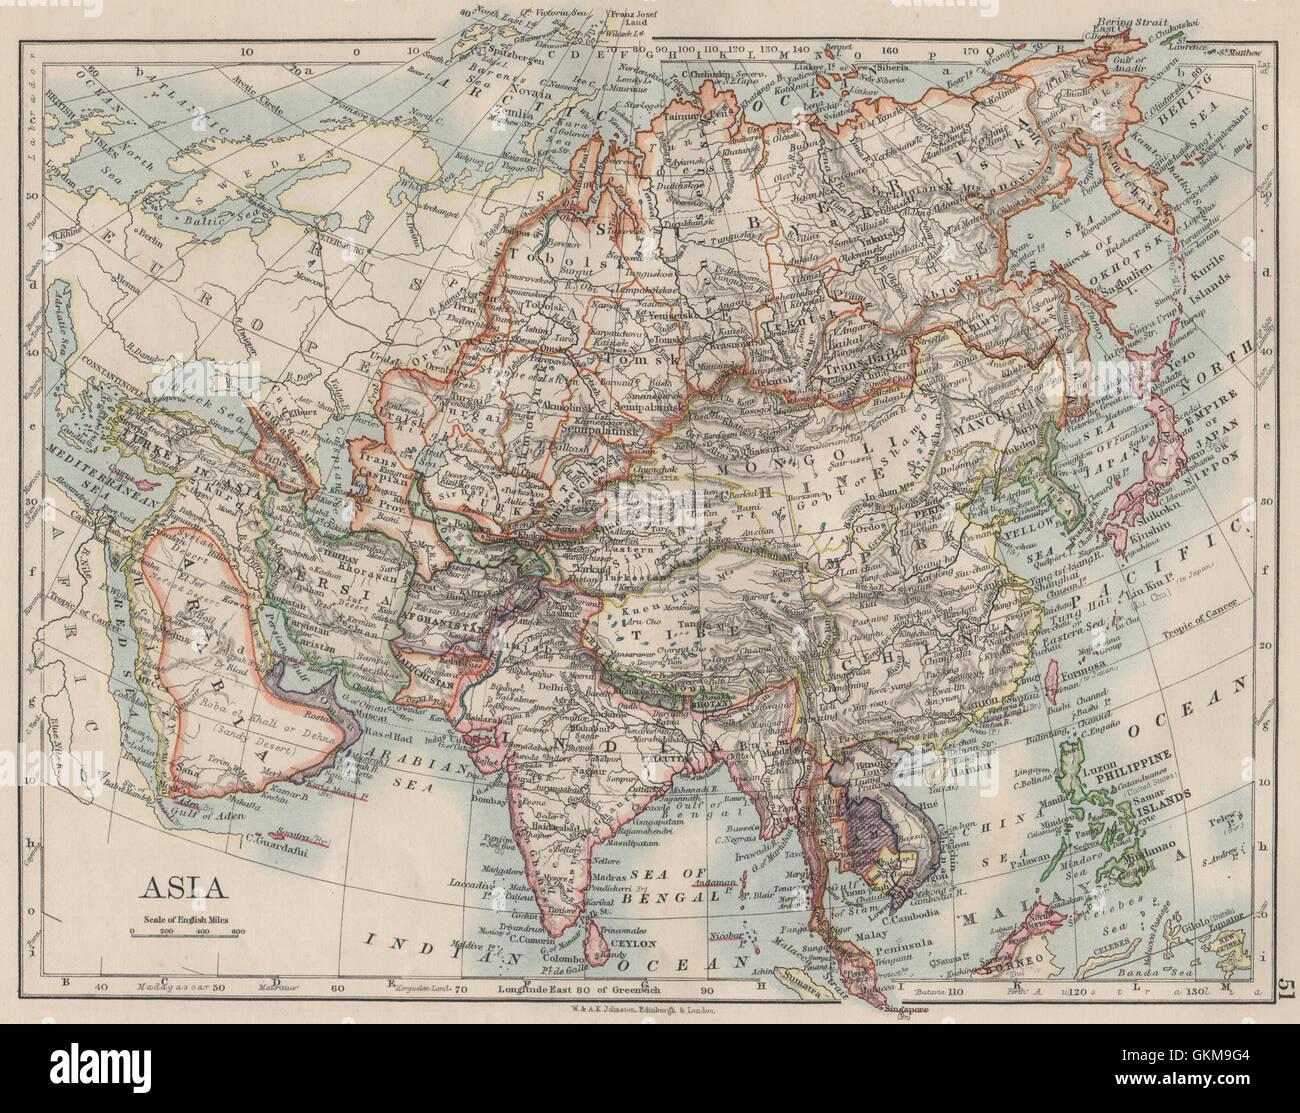 ASIA POLITICAL Persia Siam Hejaz China Japan Corea Turkestan - Japan map 1900